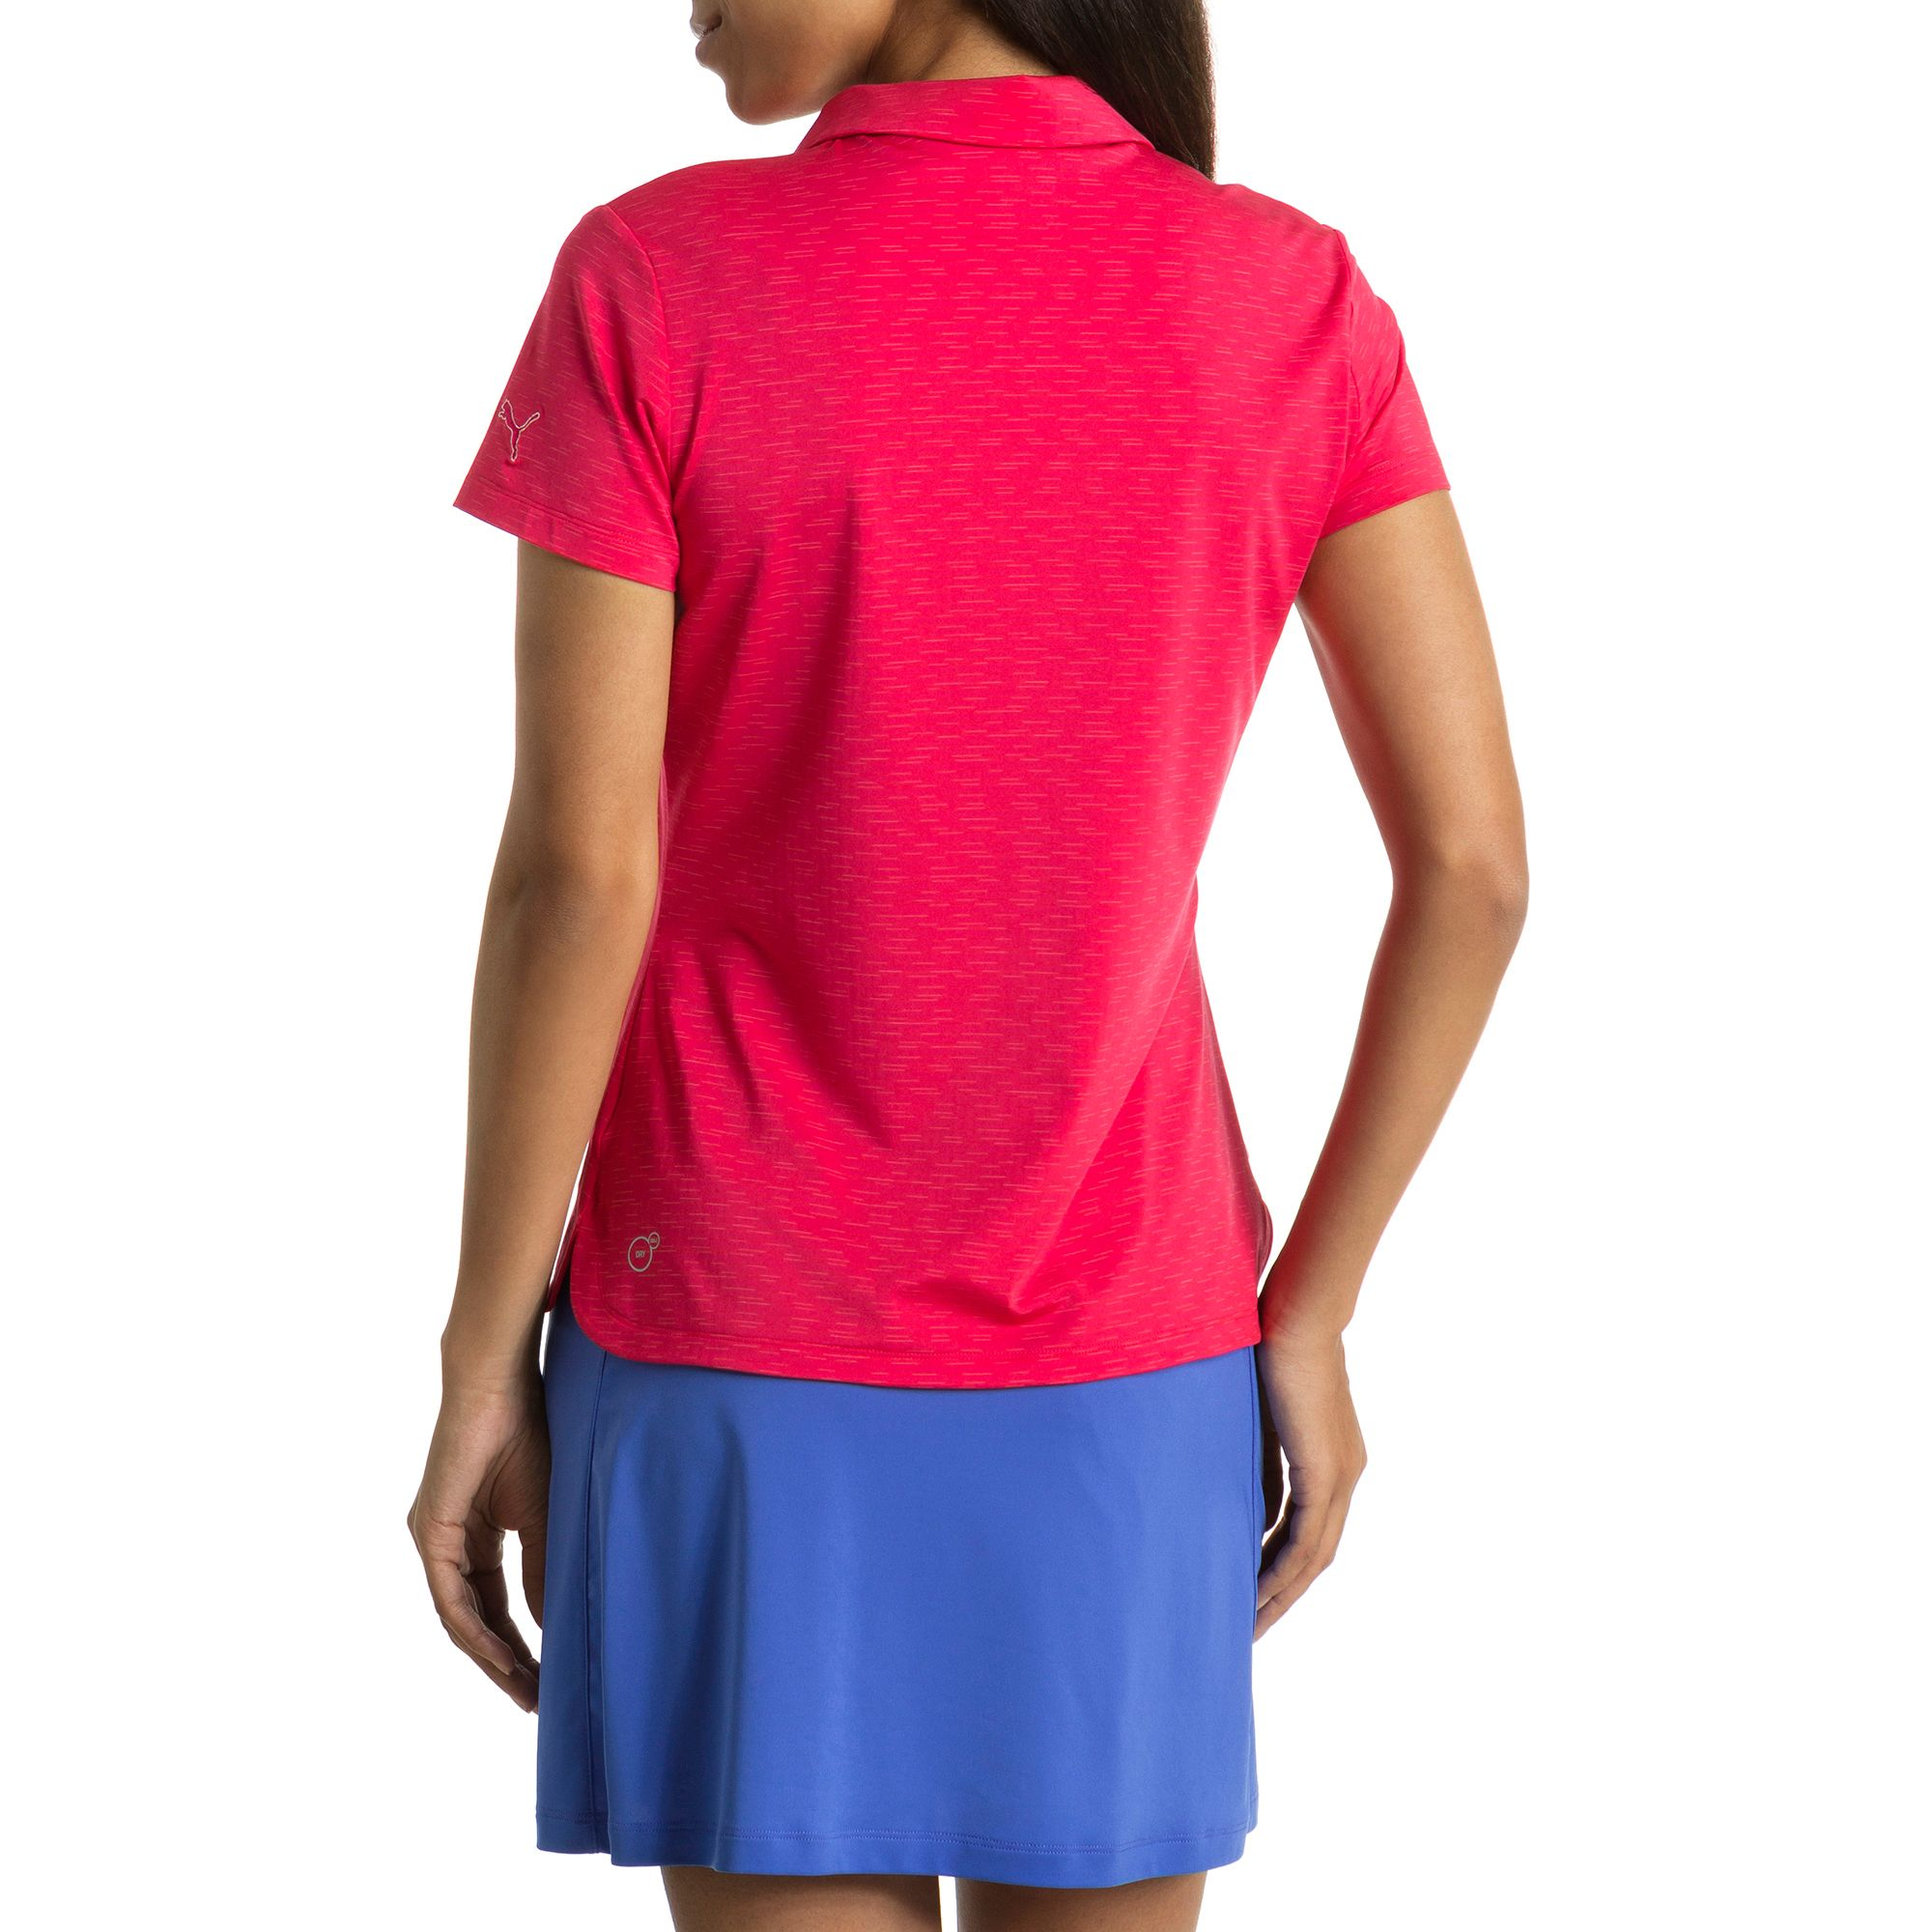 puma golf damen space dye pwrcool polo frauen polo shirt. Black Bedroom Furniture Sets. Home Design Ideas